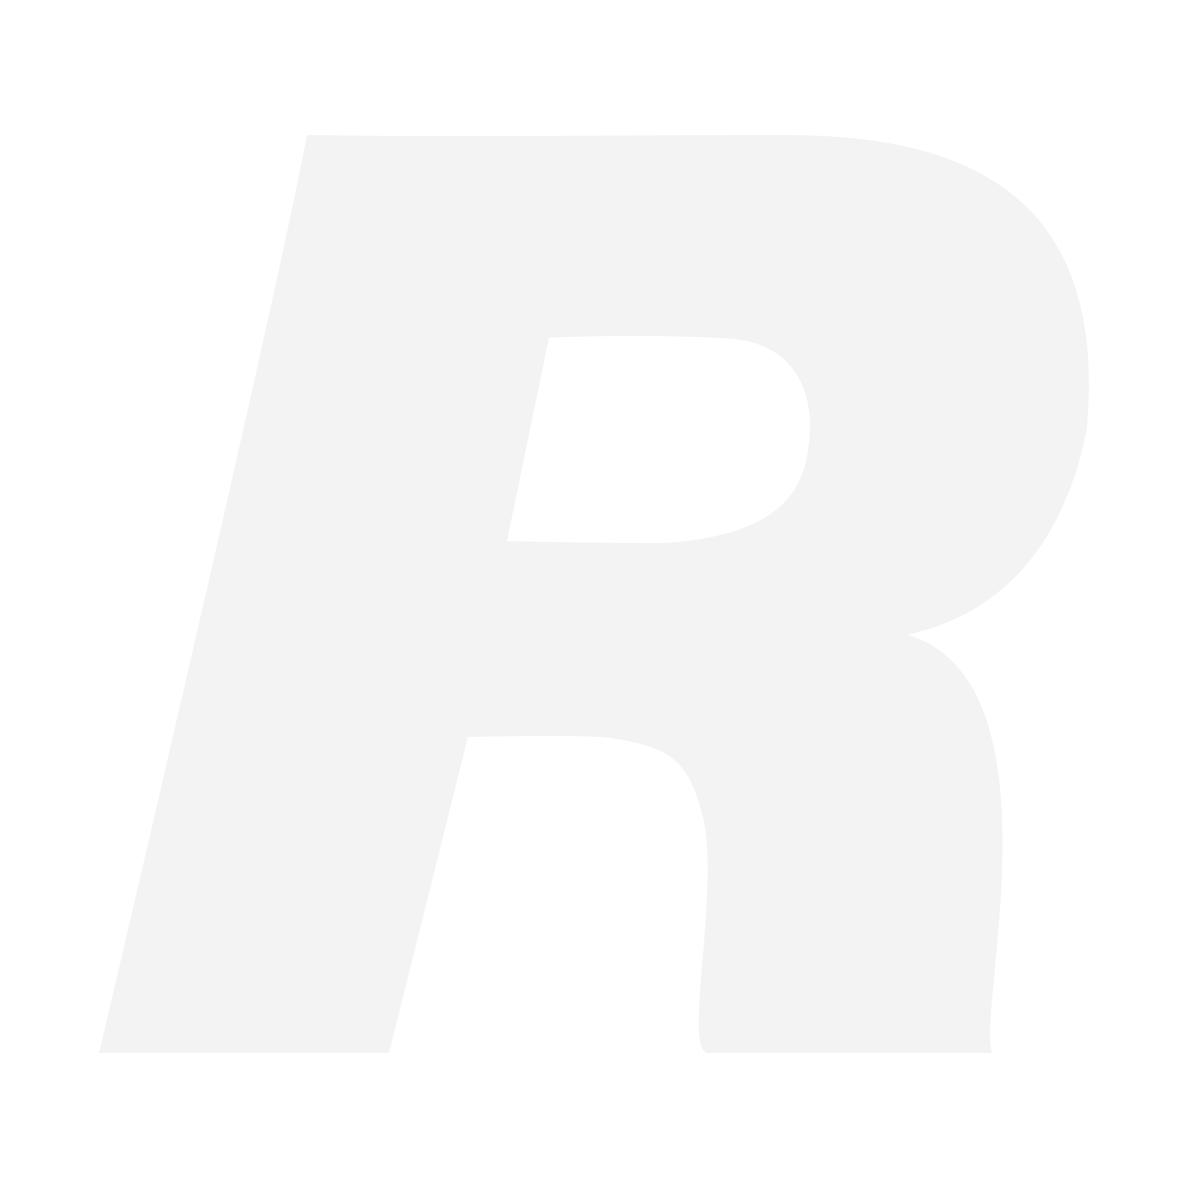 OLYMPUS HLD-7 KÄYTETTY (M1)